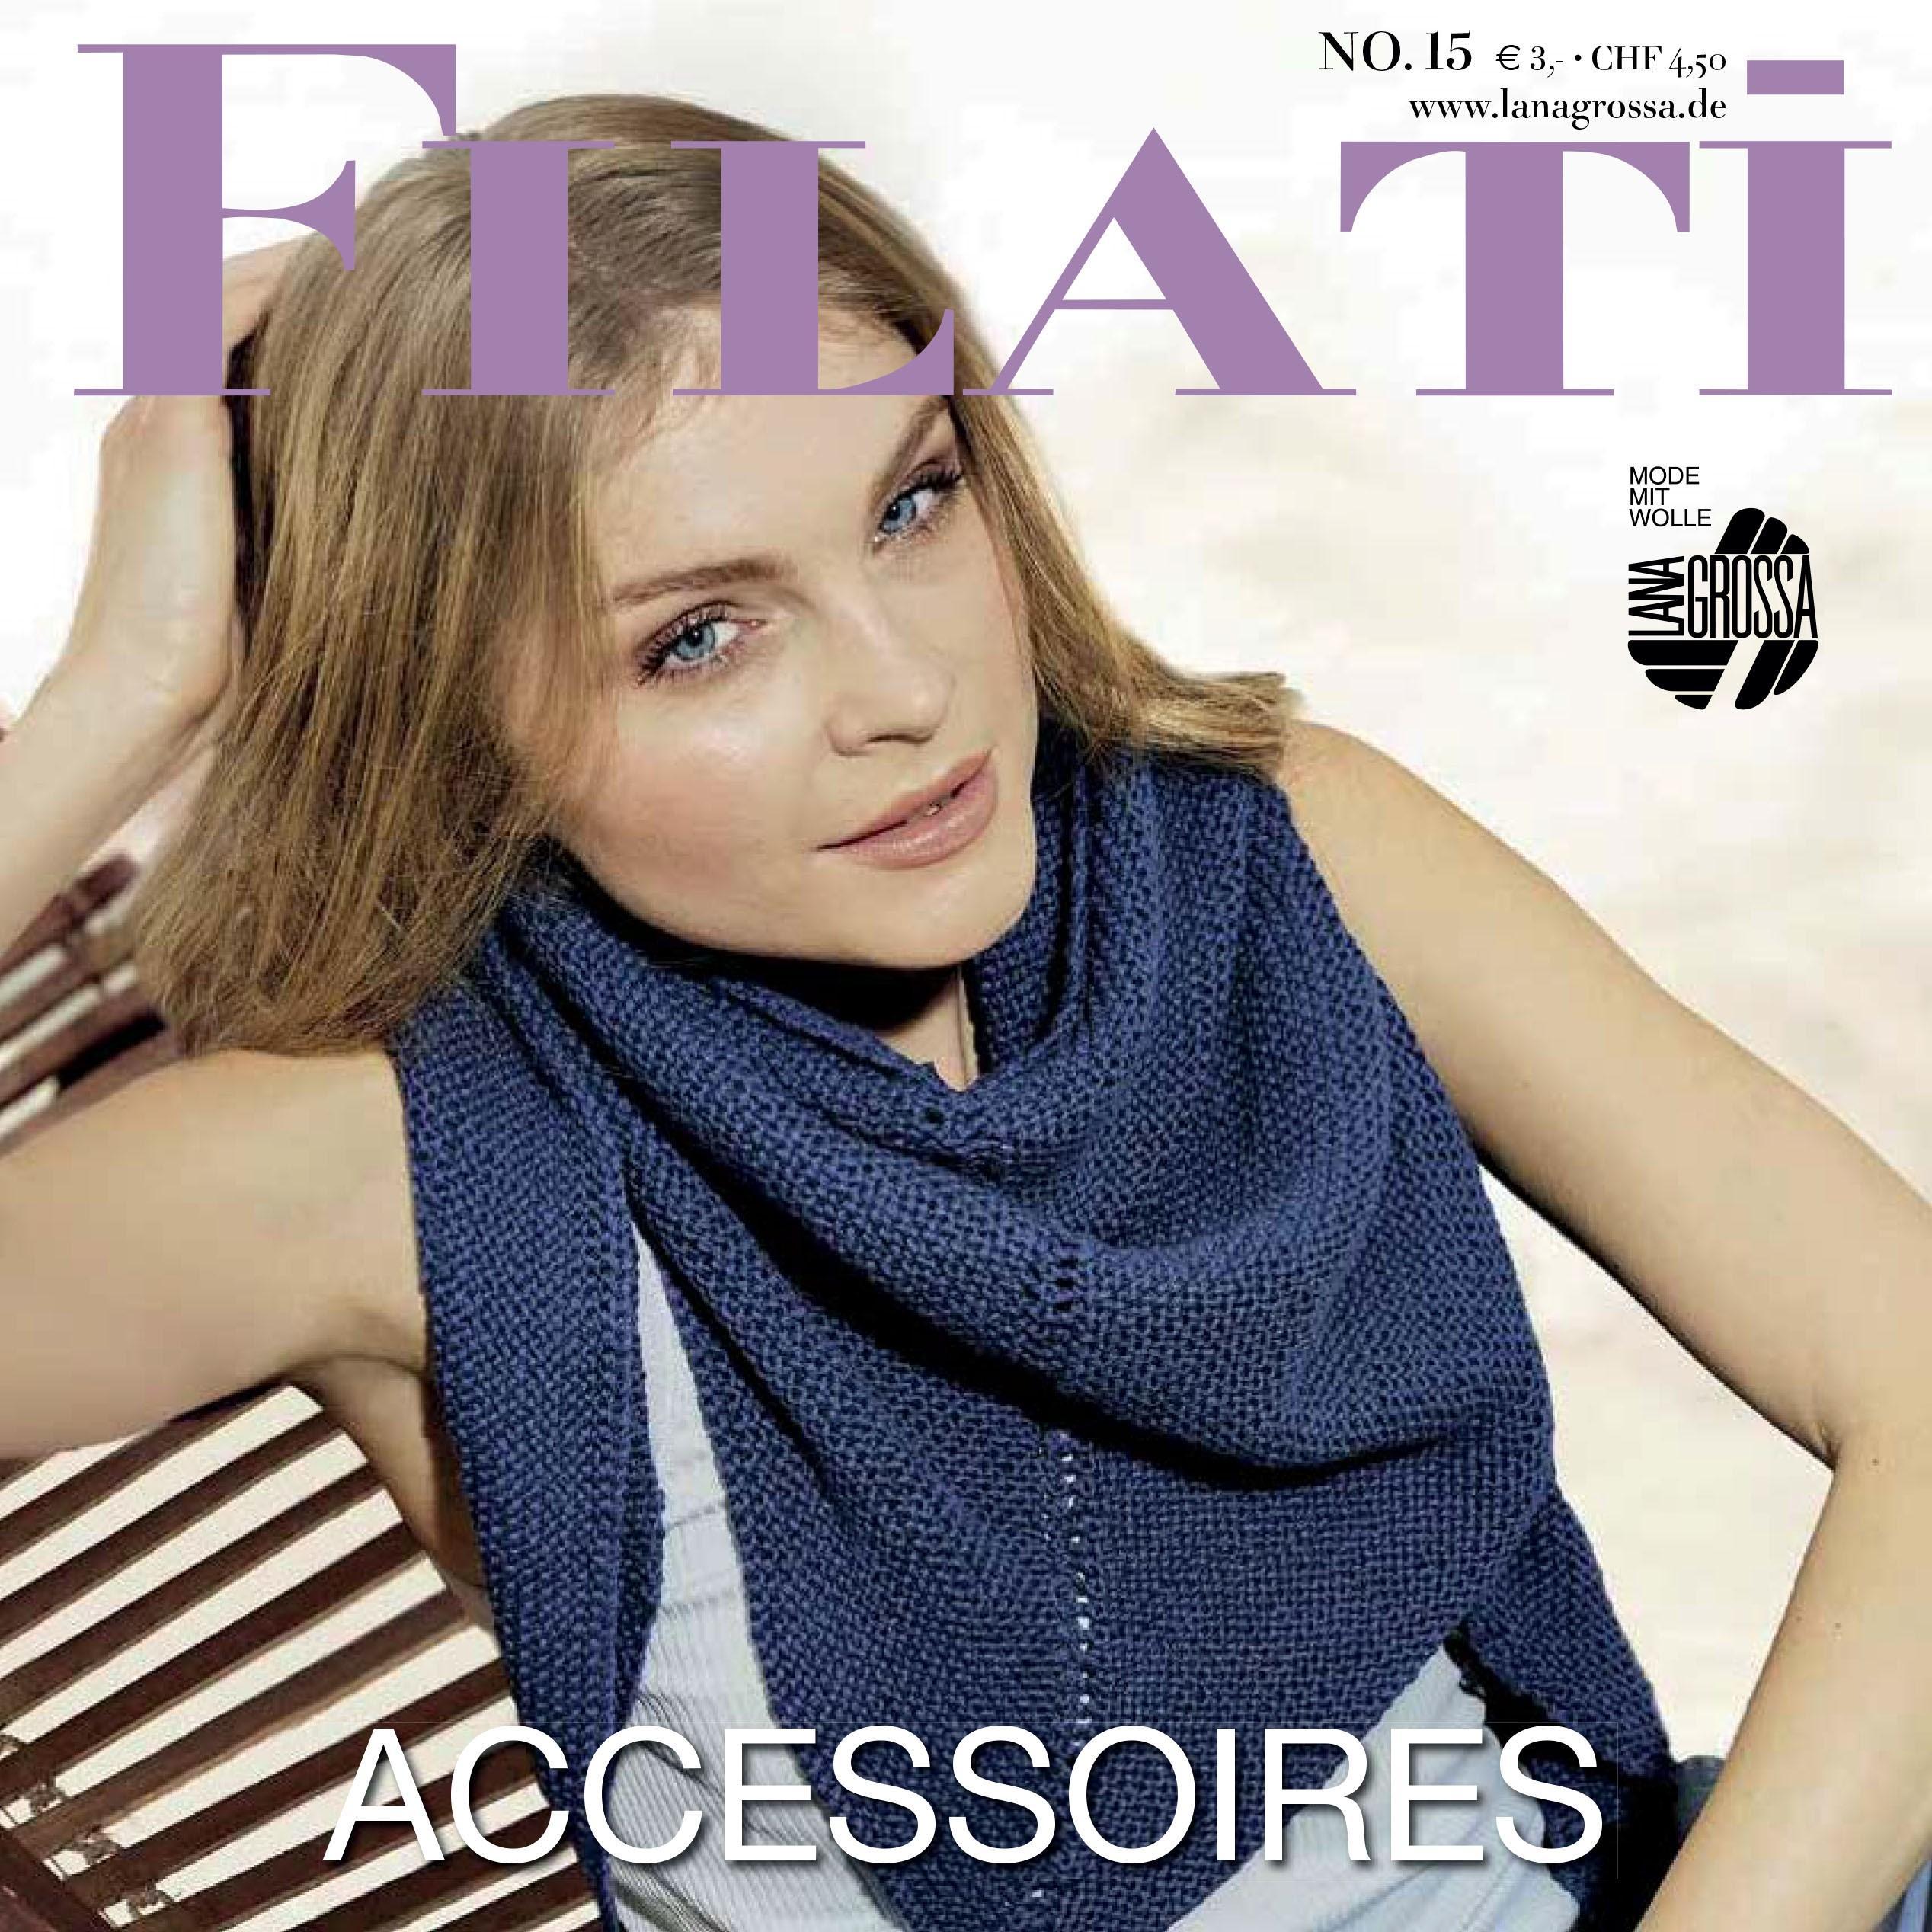 Lana Grossa FILATI Accessoires No. 15 - German Edition